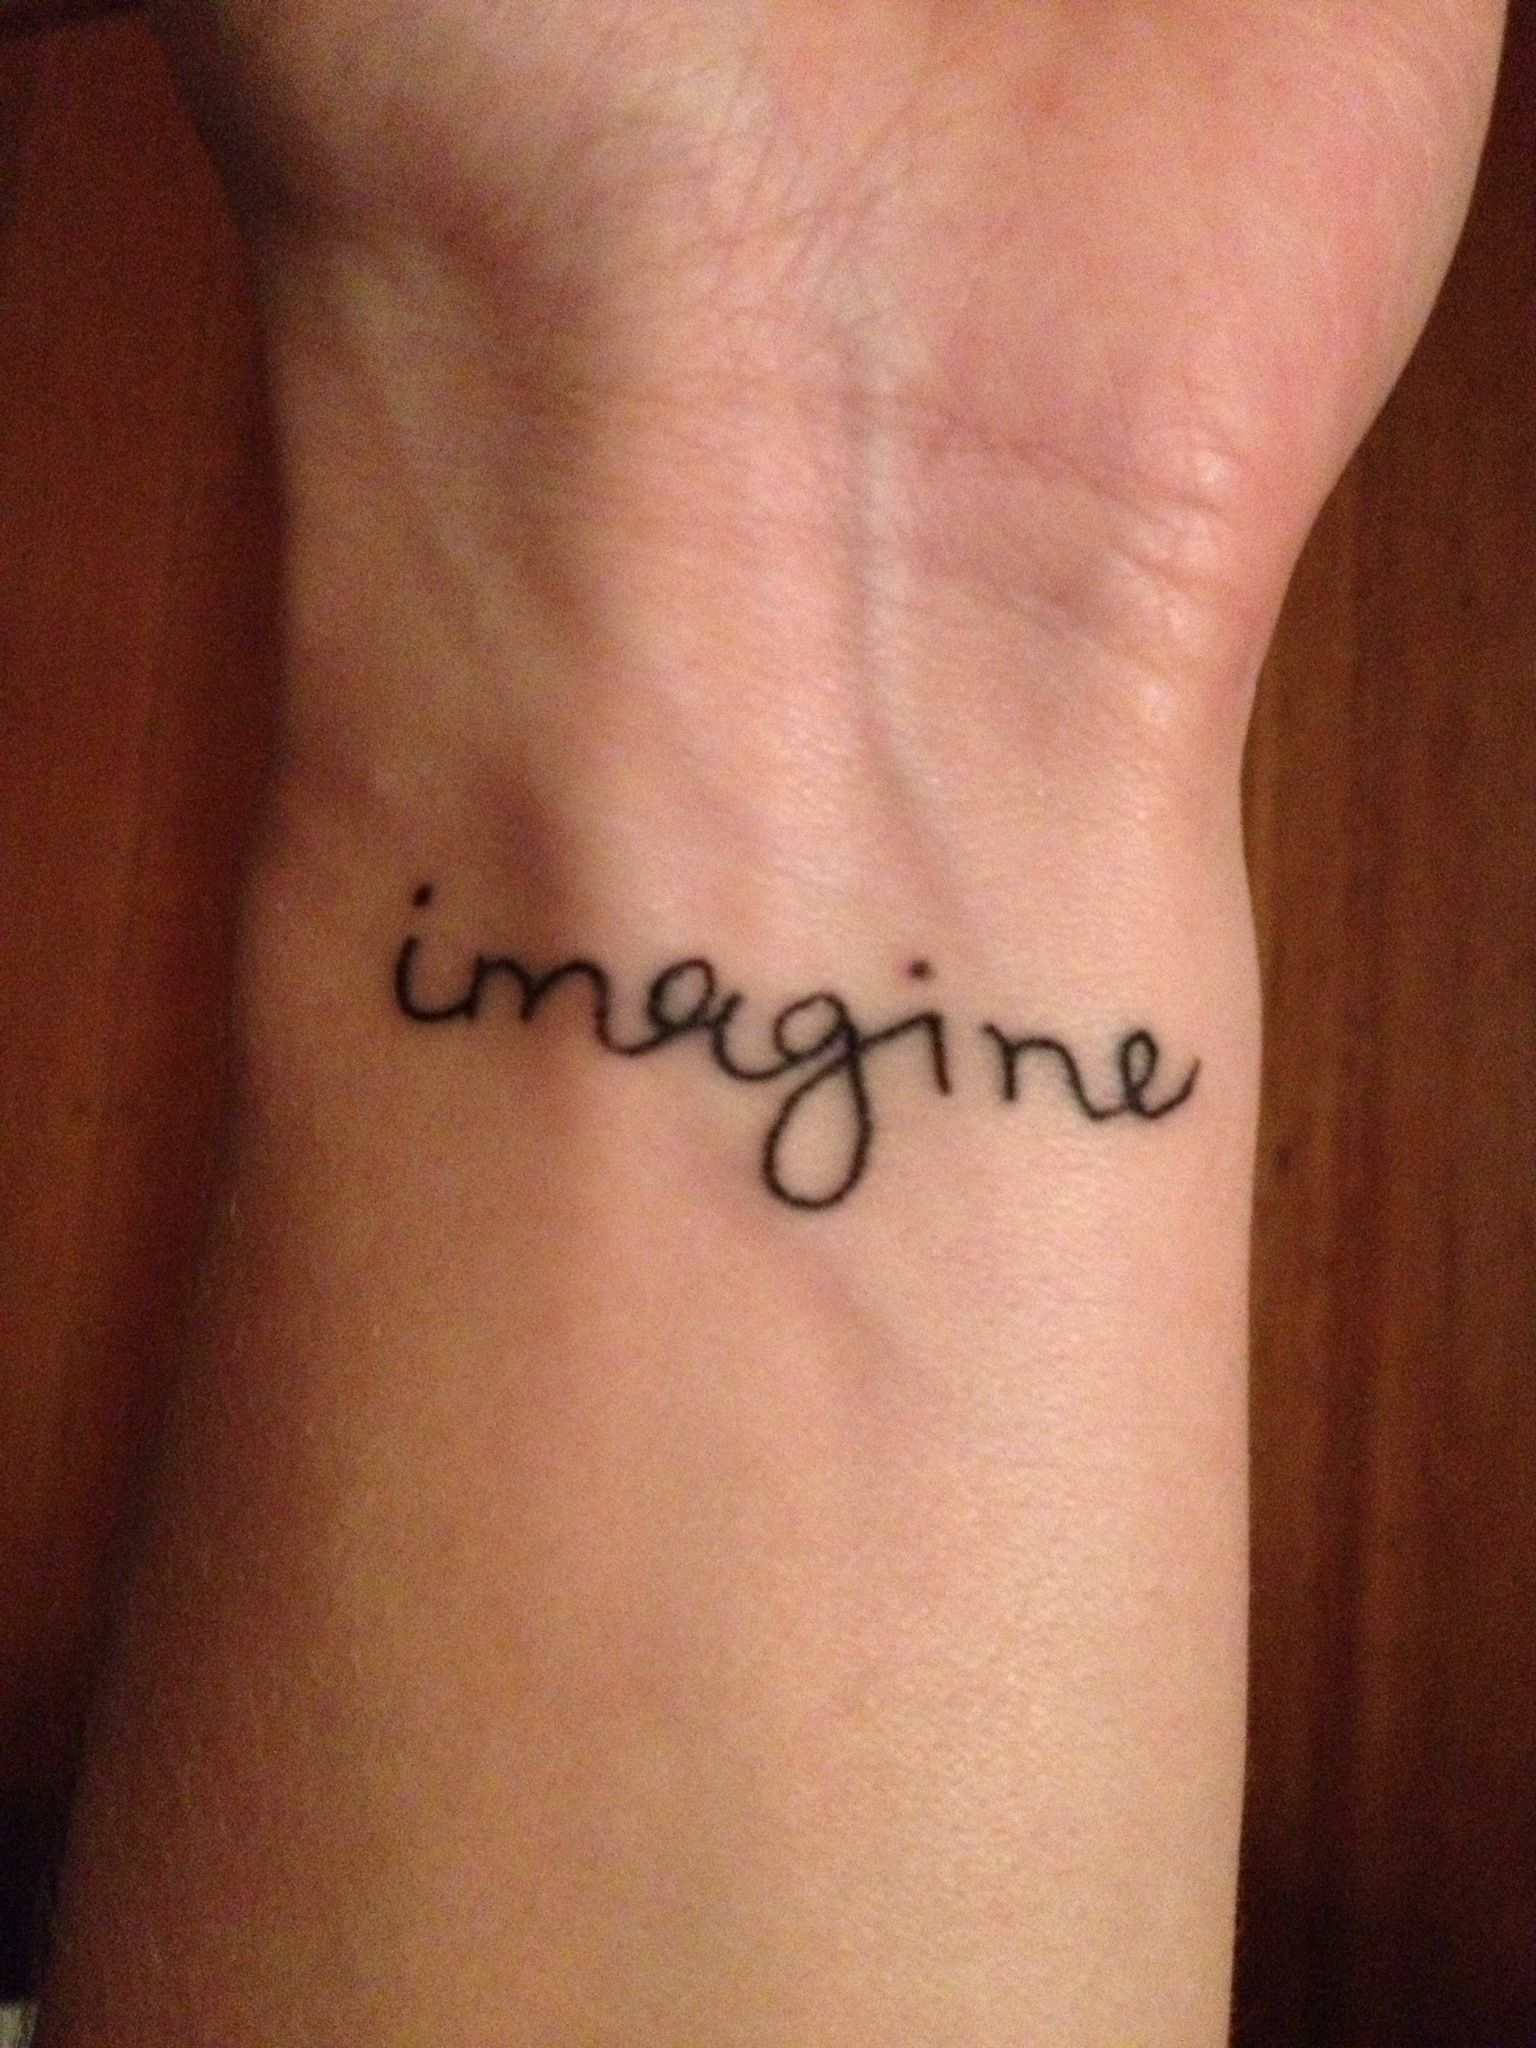 Pin By Dena Taylor On Art Handwriting Tattoos Tattoos Red Ink Tattoos